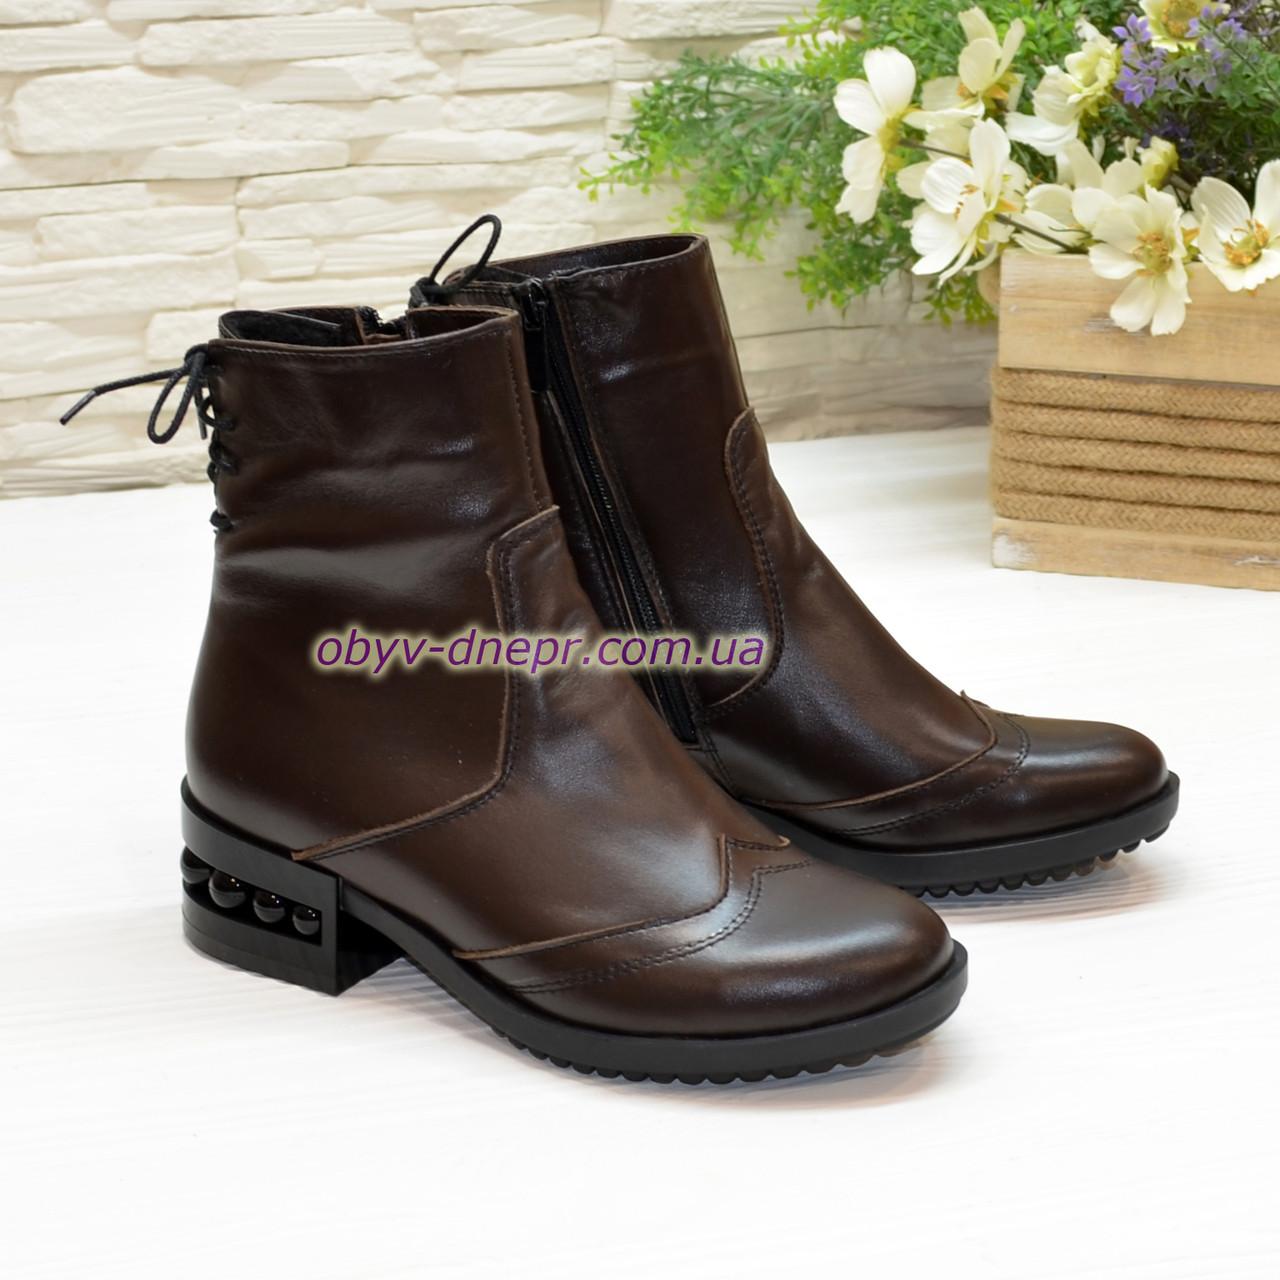 Ботинки кожаные на маленьком каблуке, сзади на шнуровке